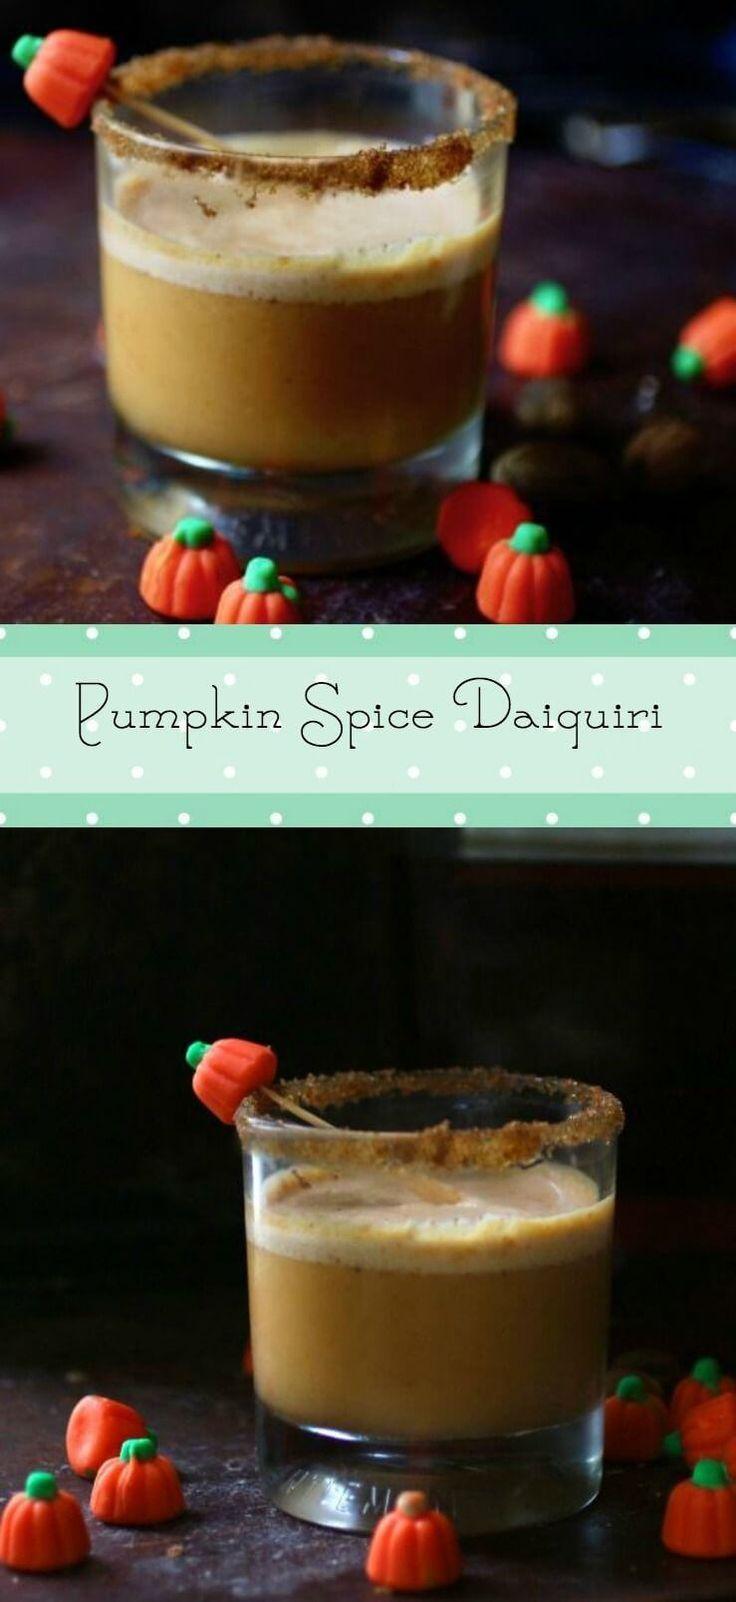 Pumpkin spice daiquiri recipe daiquiri cocktail for Cocktail daiquiri